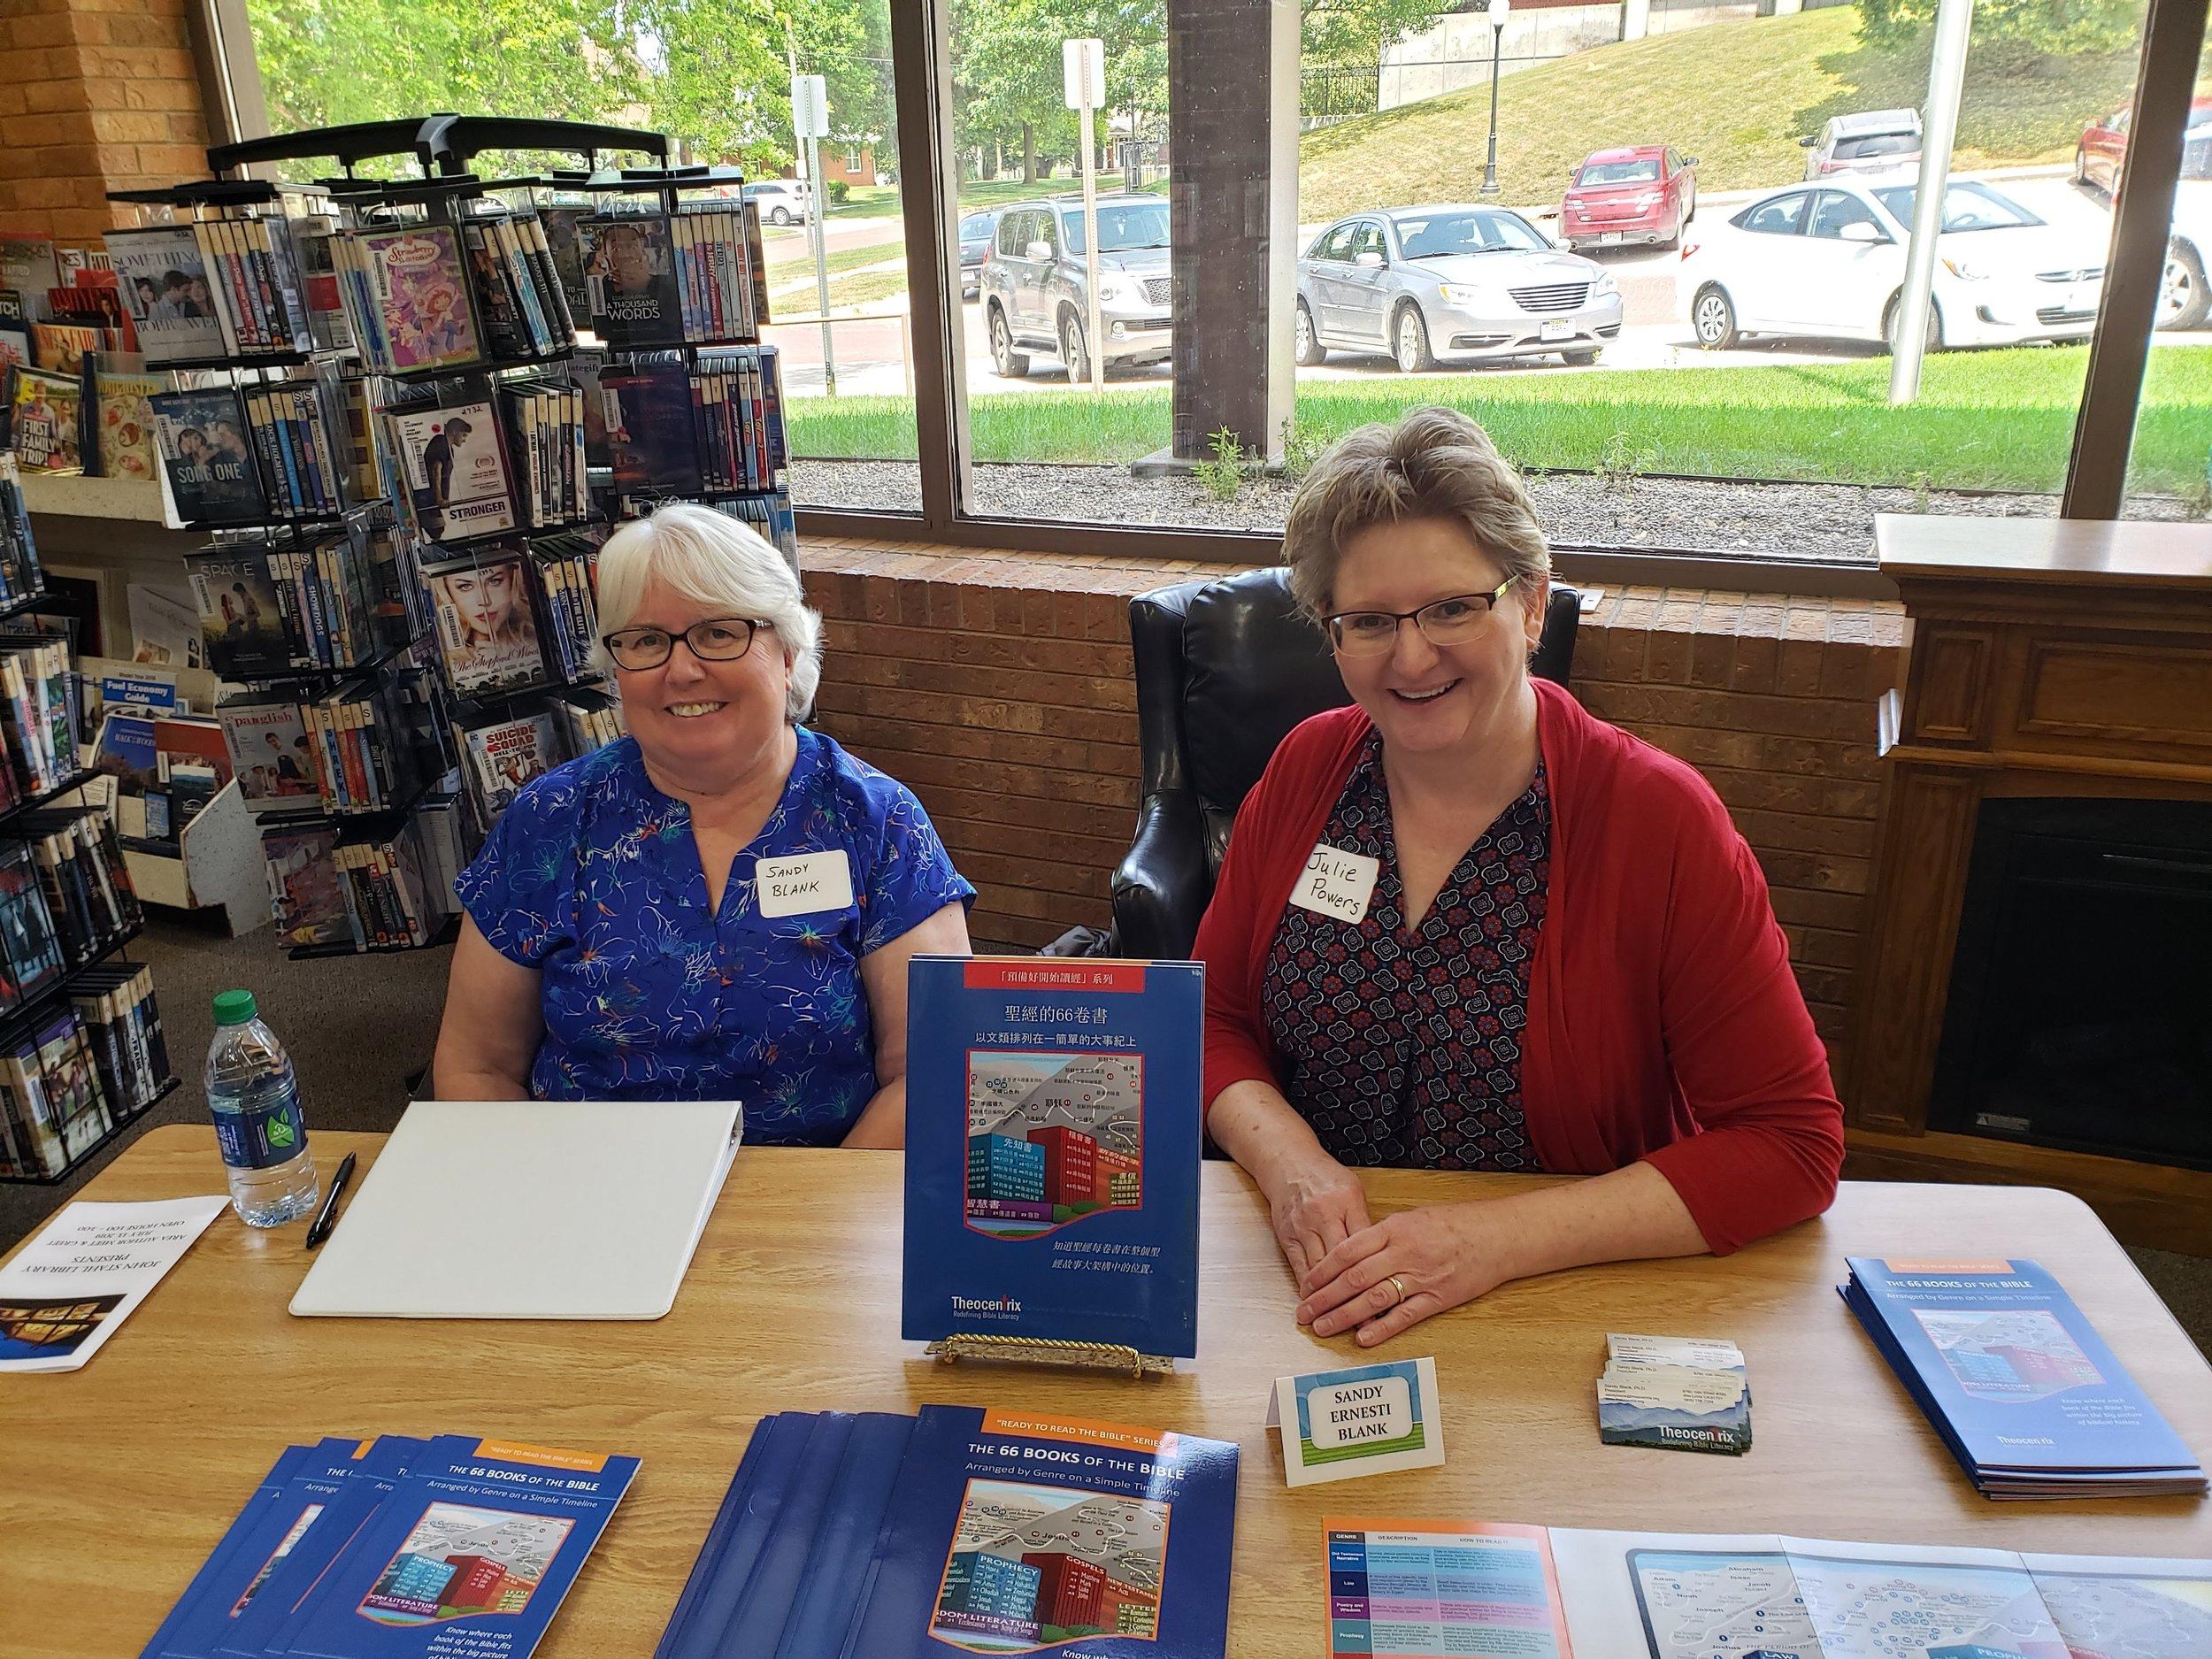 Authors Sandy (Ernesti) Blank and Julie Powers